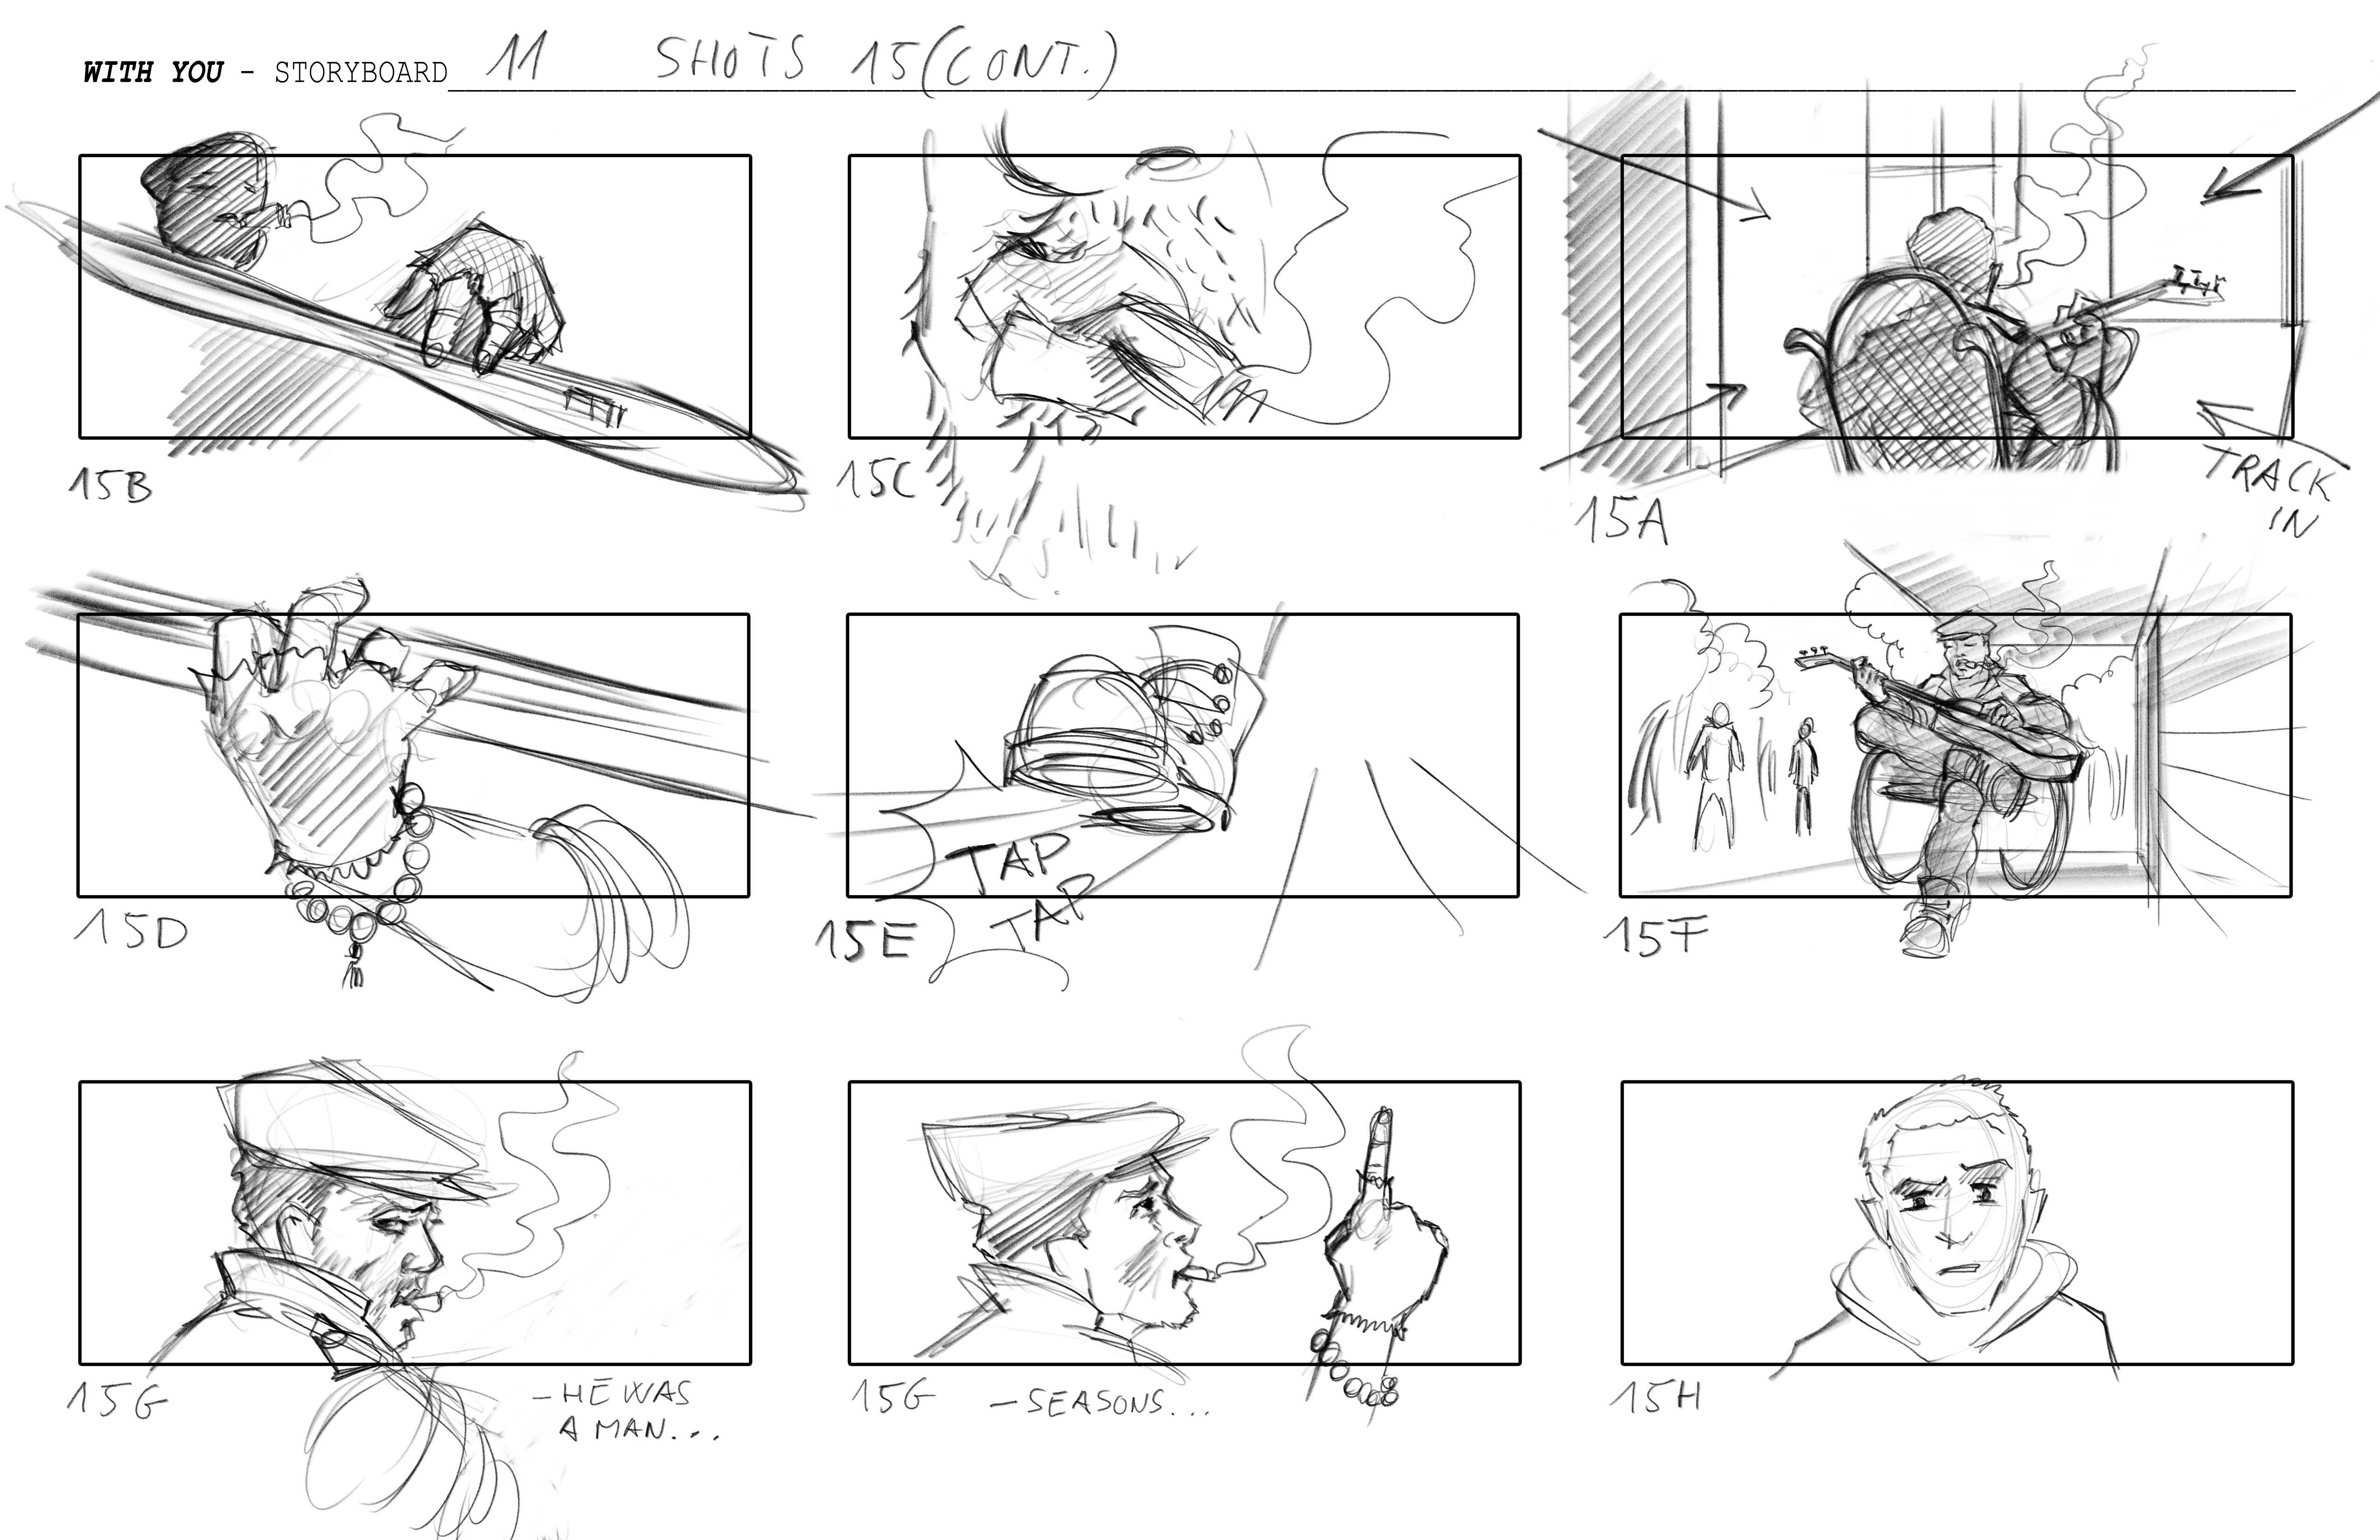 storyboard sheet 11